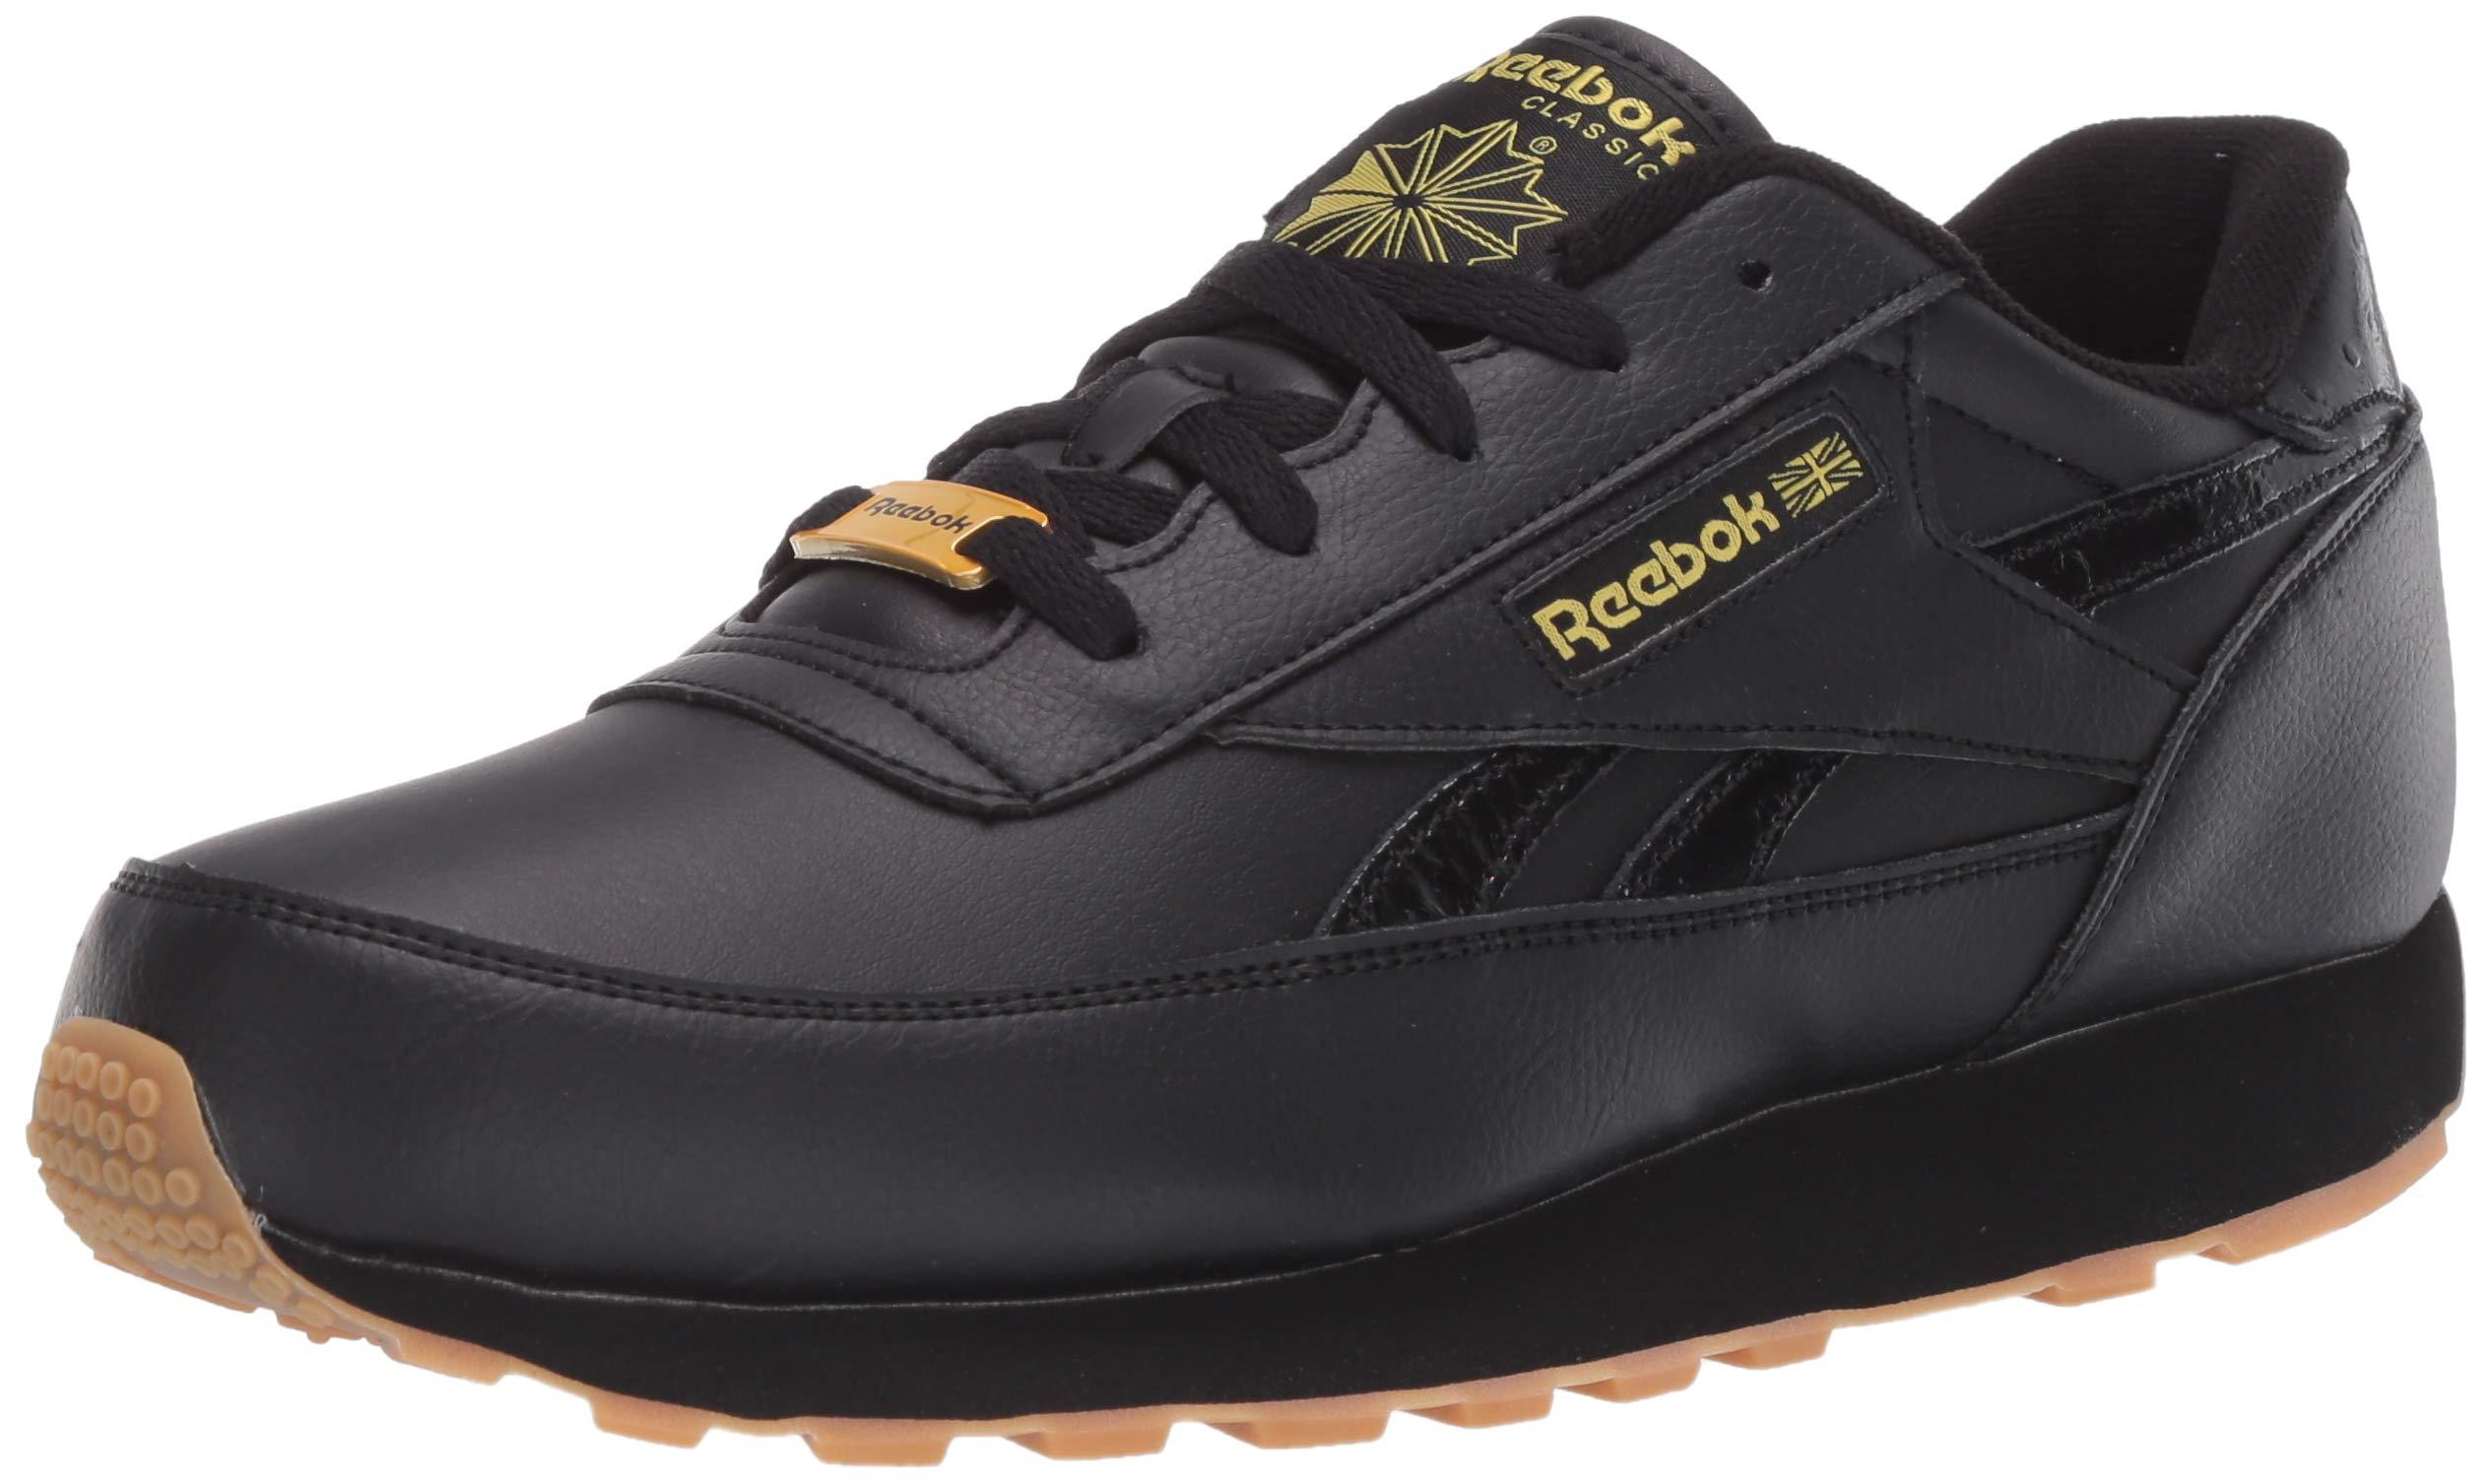 Reebok Men's Classic Renaissance Wide 4e Walking Shoe